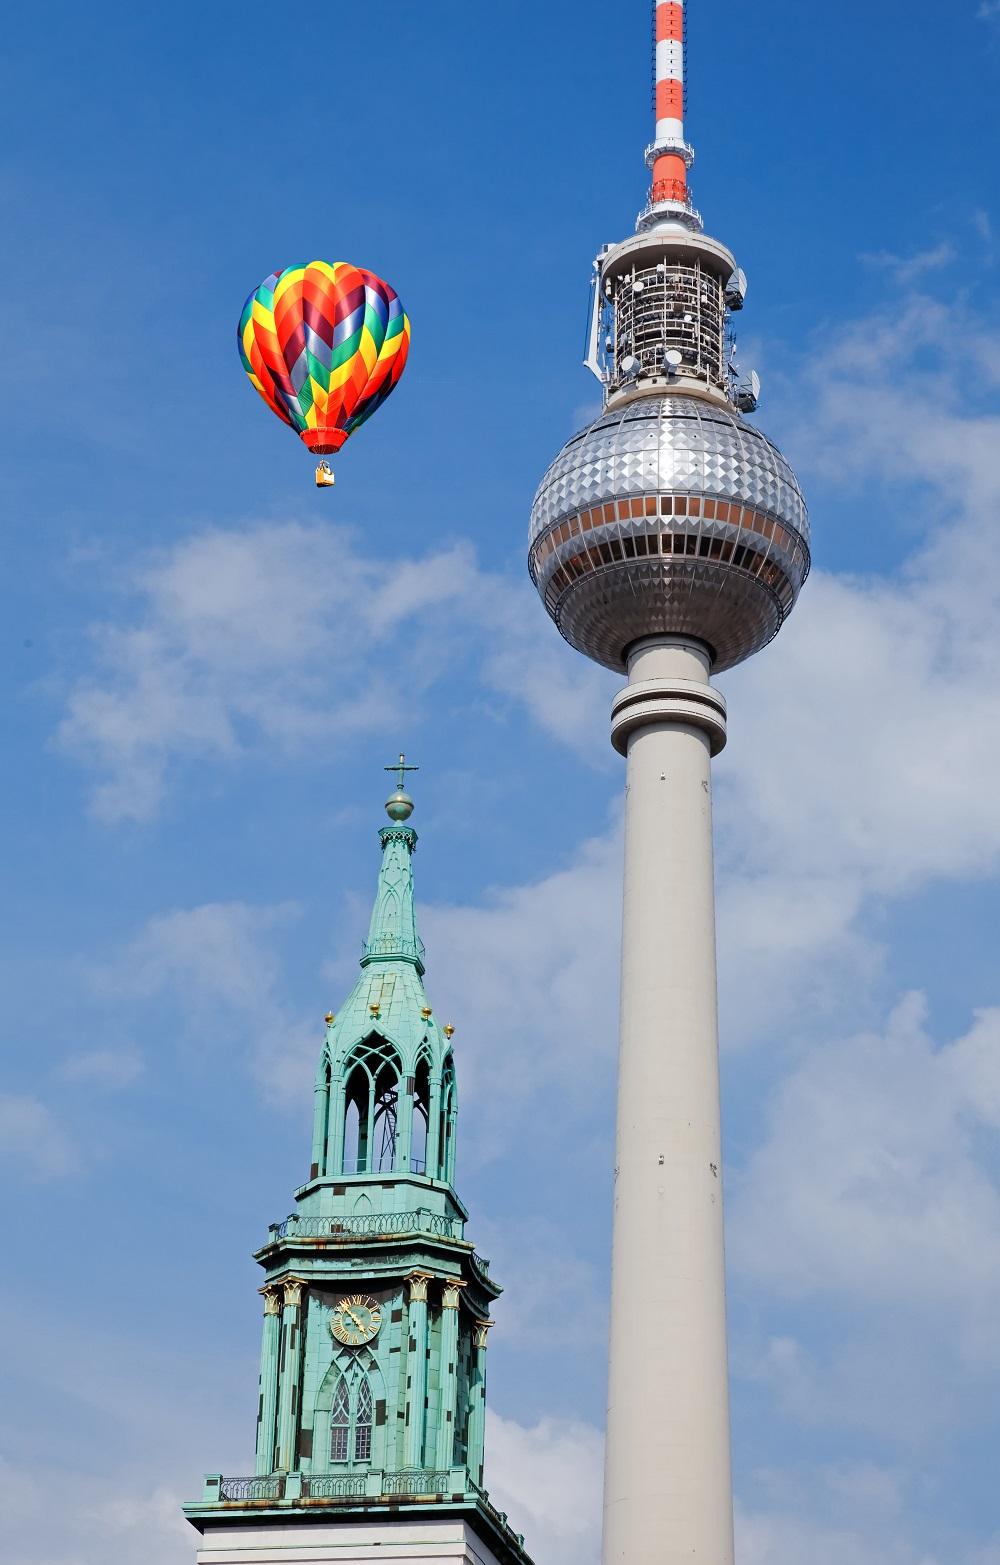 Ballonfahrt in Berlin